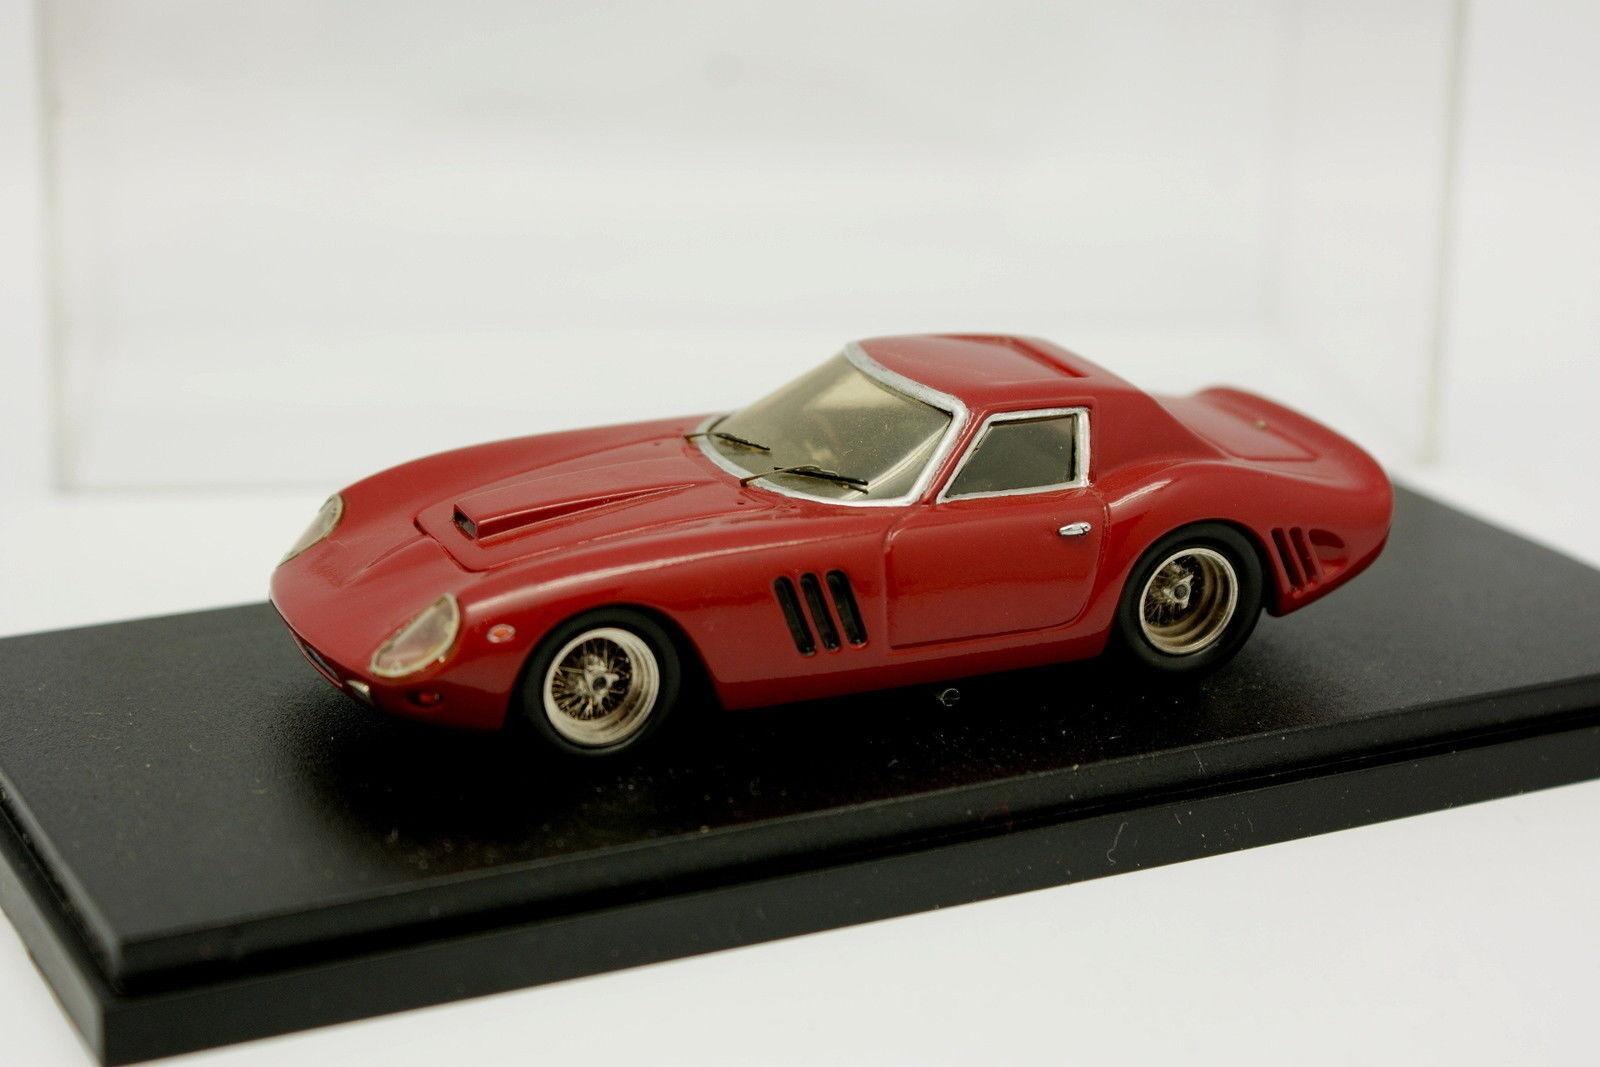 AMR 1 43 43 43 - Ferrari 250 Gto 1964 Red Dark Club France 826d5a